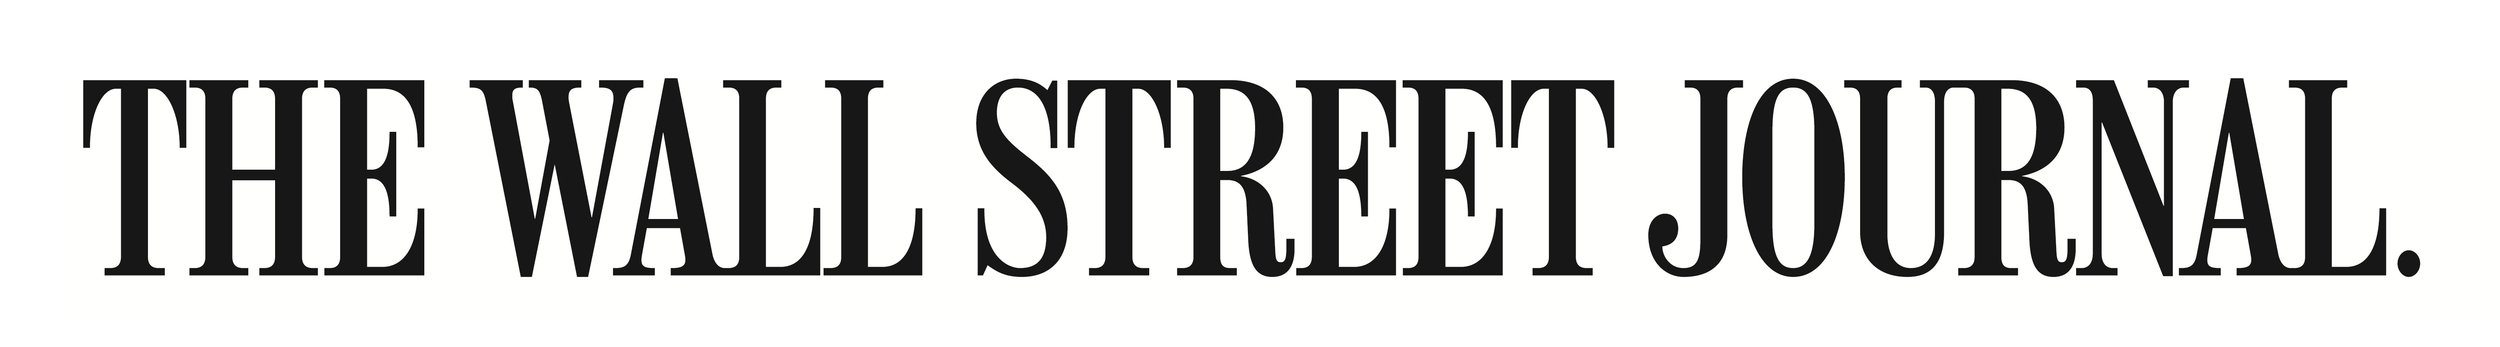 wall-street-journal-logo-white-png-the-wall-street-journal-1.jpg